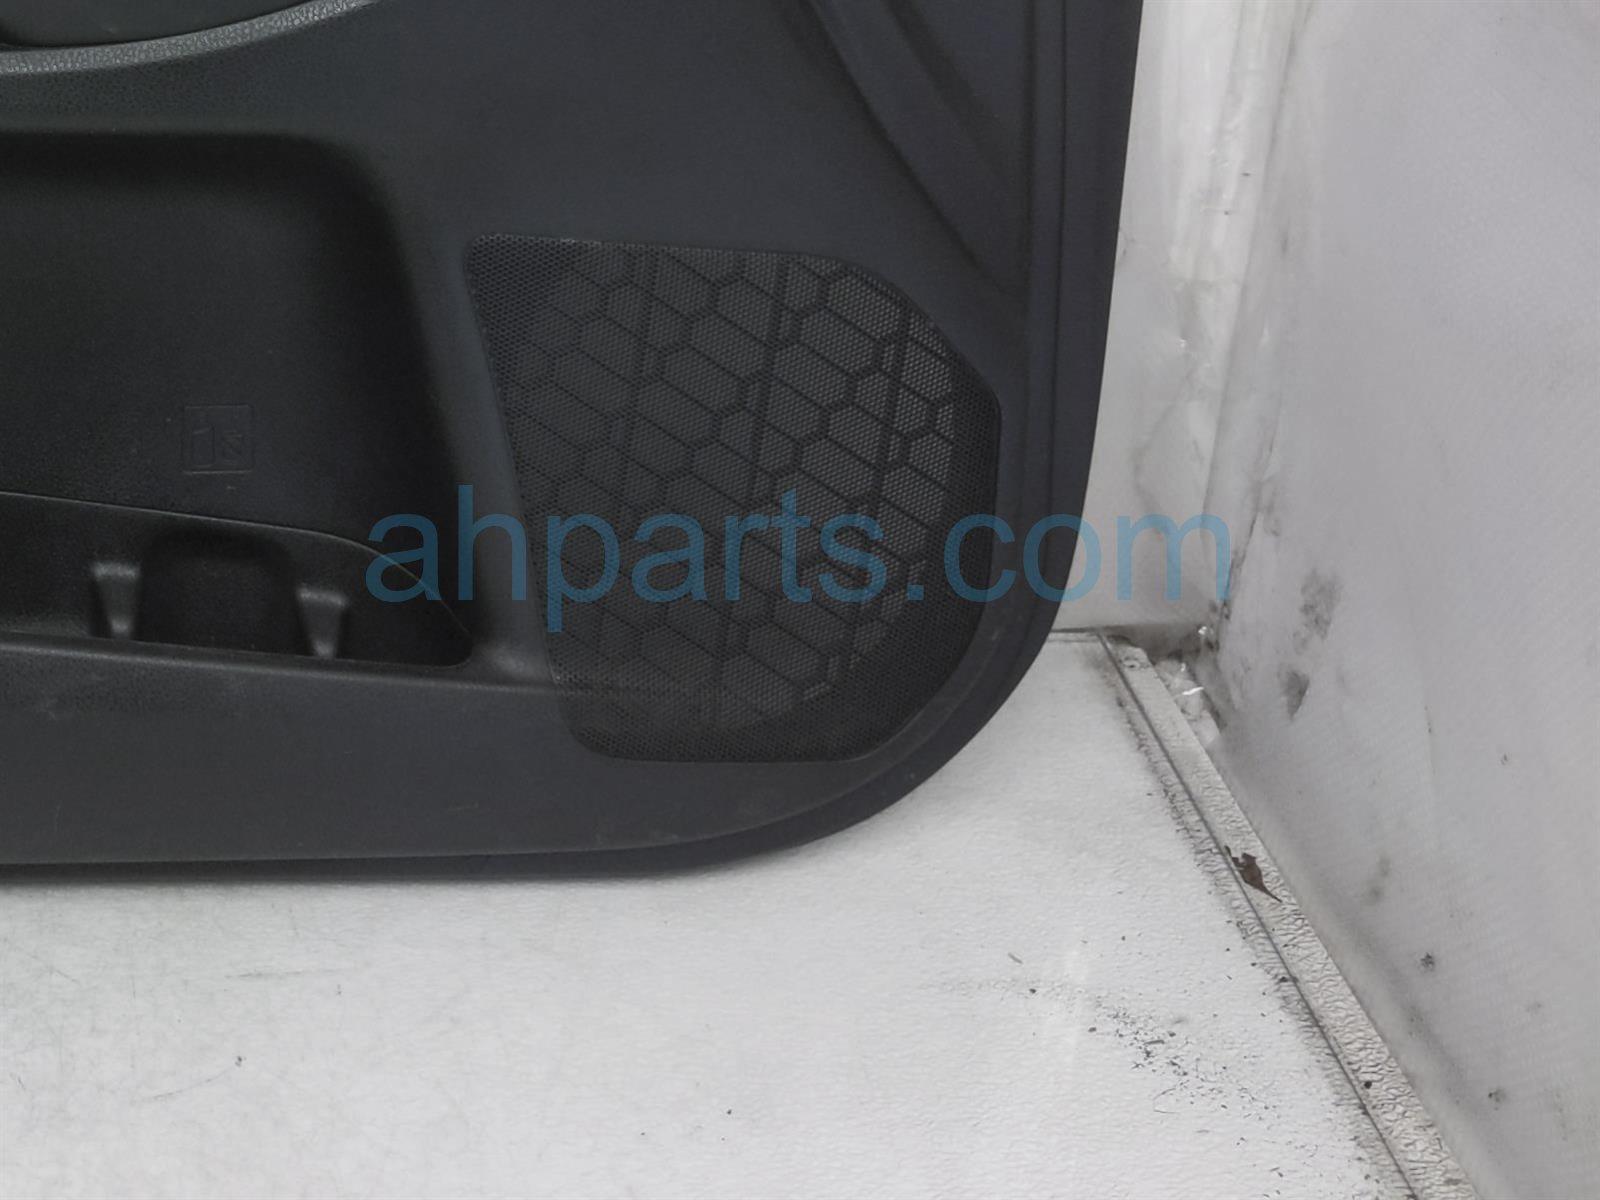 2014 Toyota Highlander Trim / Liner Front Driver Interior Door Panel   Black   67620 0E541 C2 Replacement